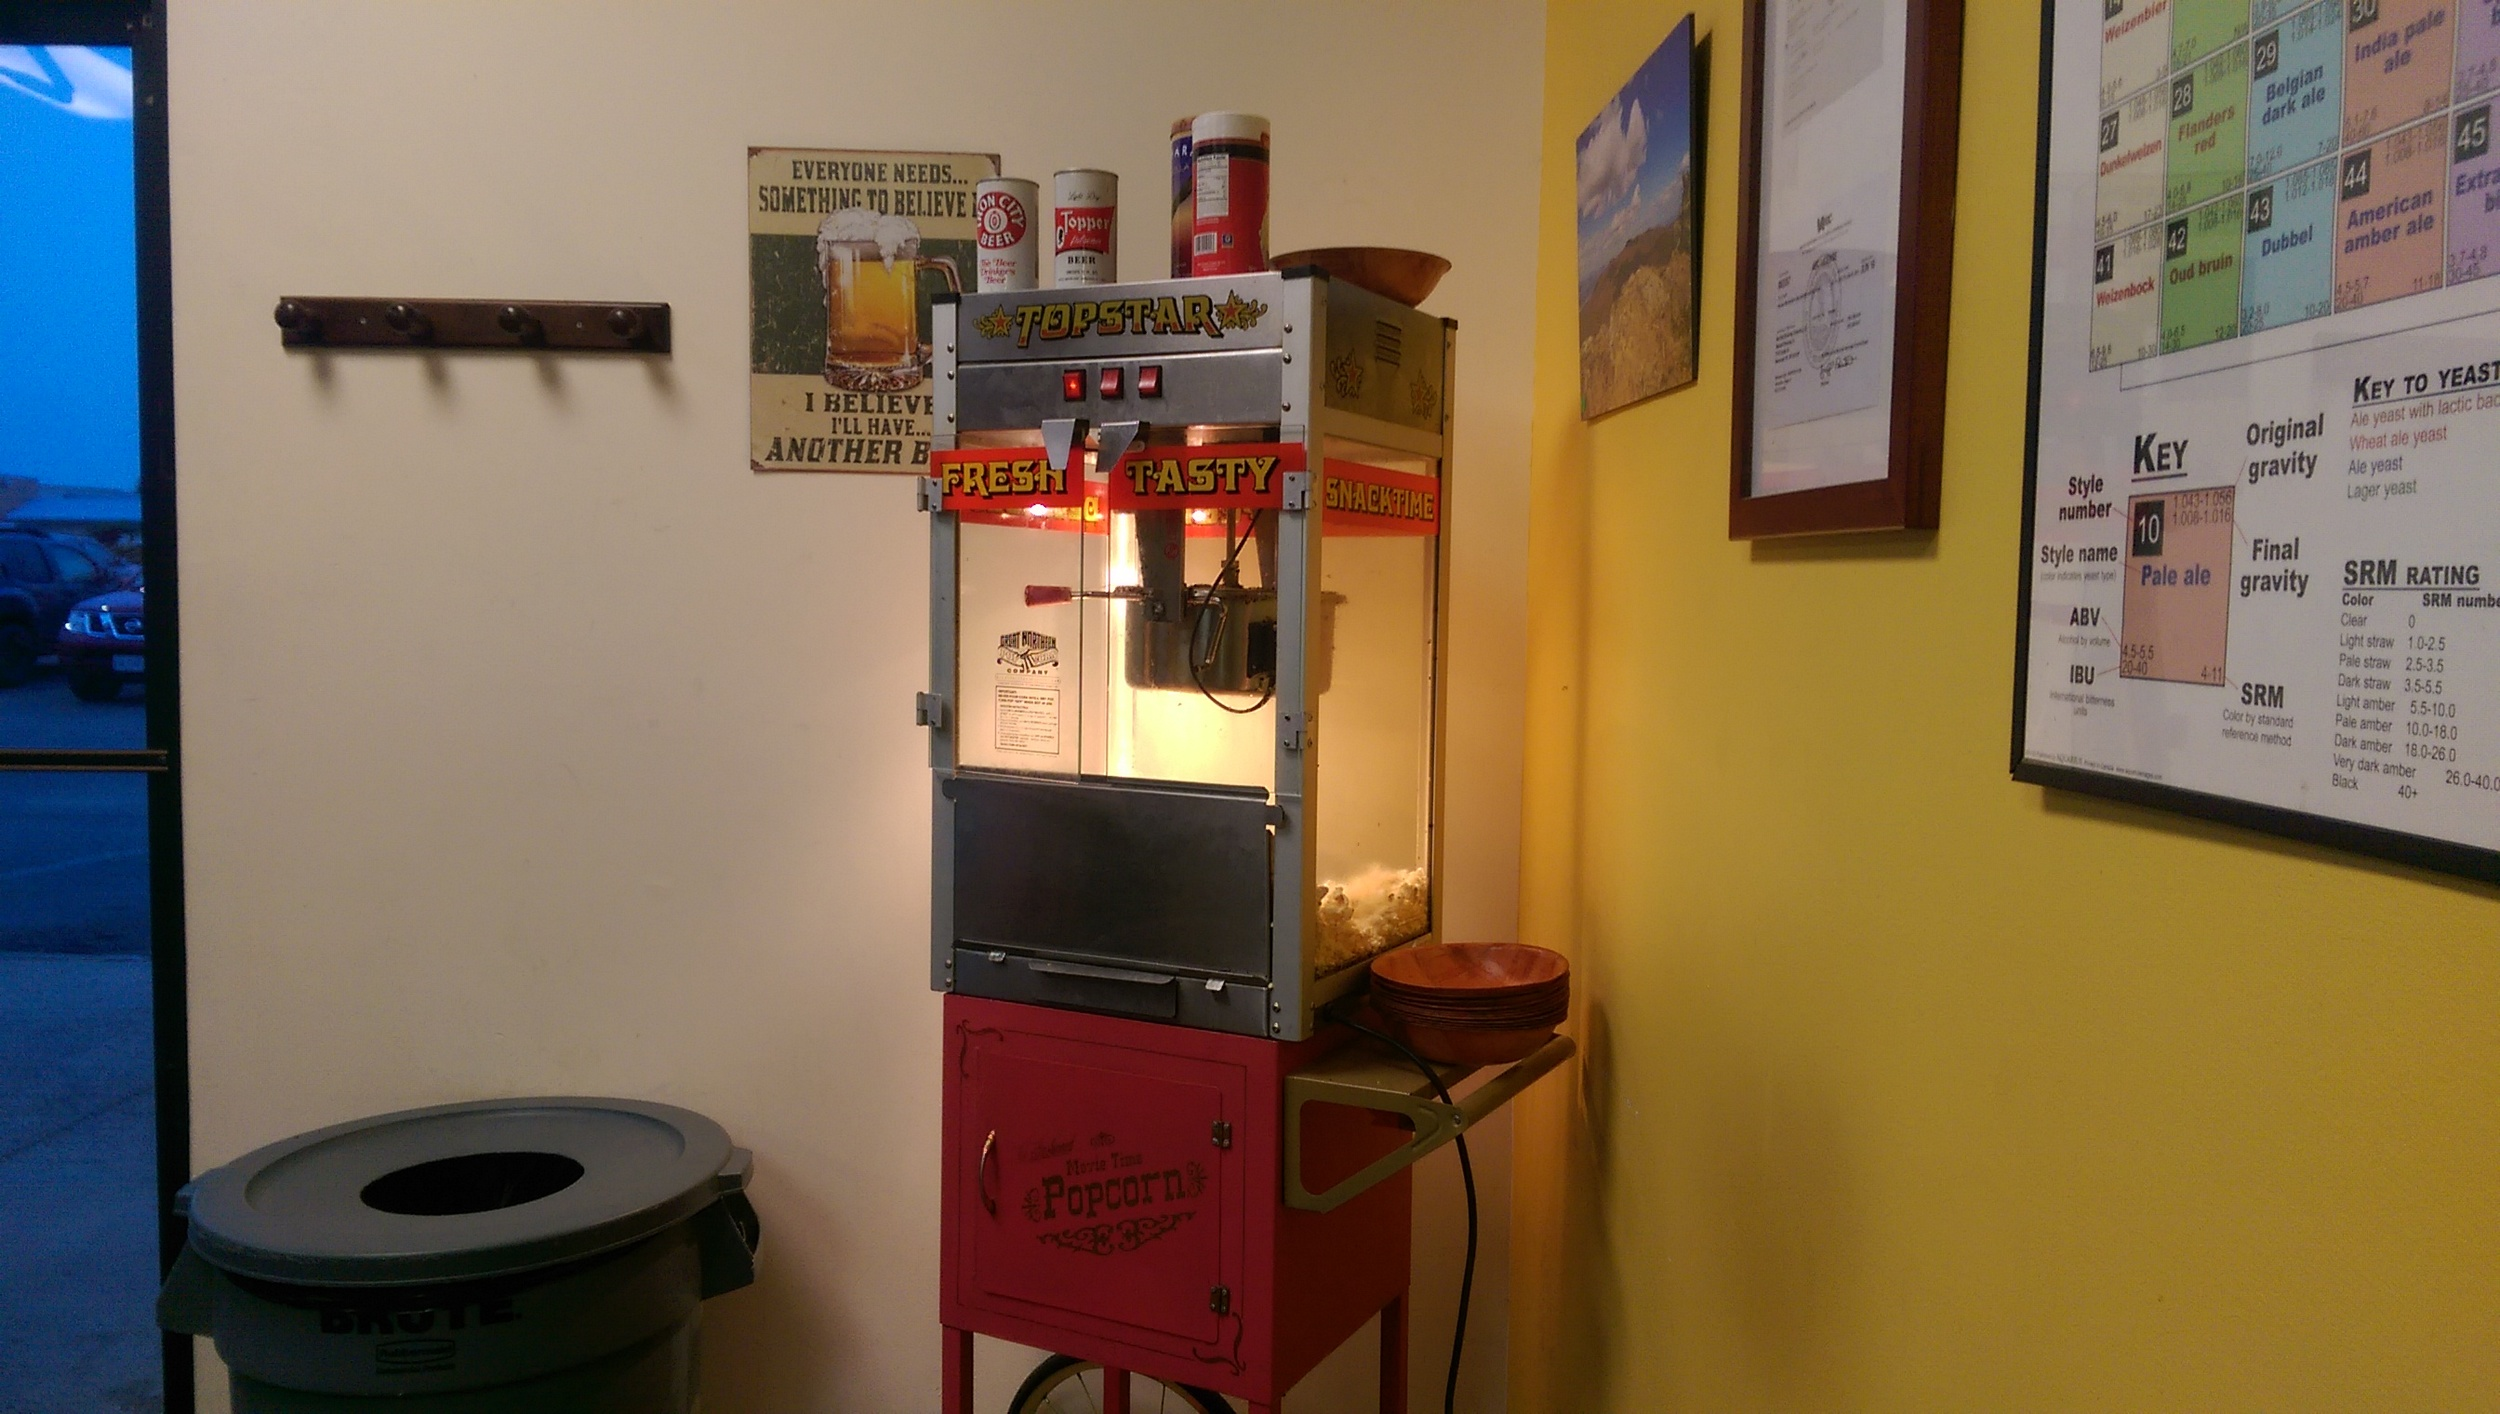 Popcorn is always ready at BadWolf Brewing